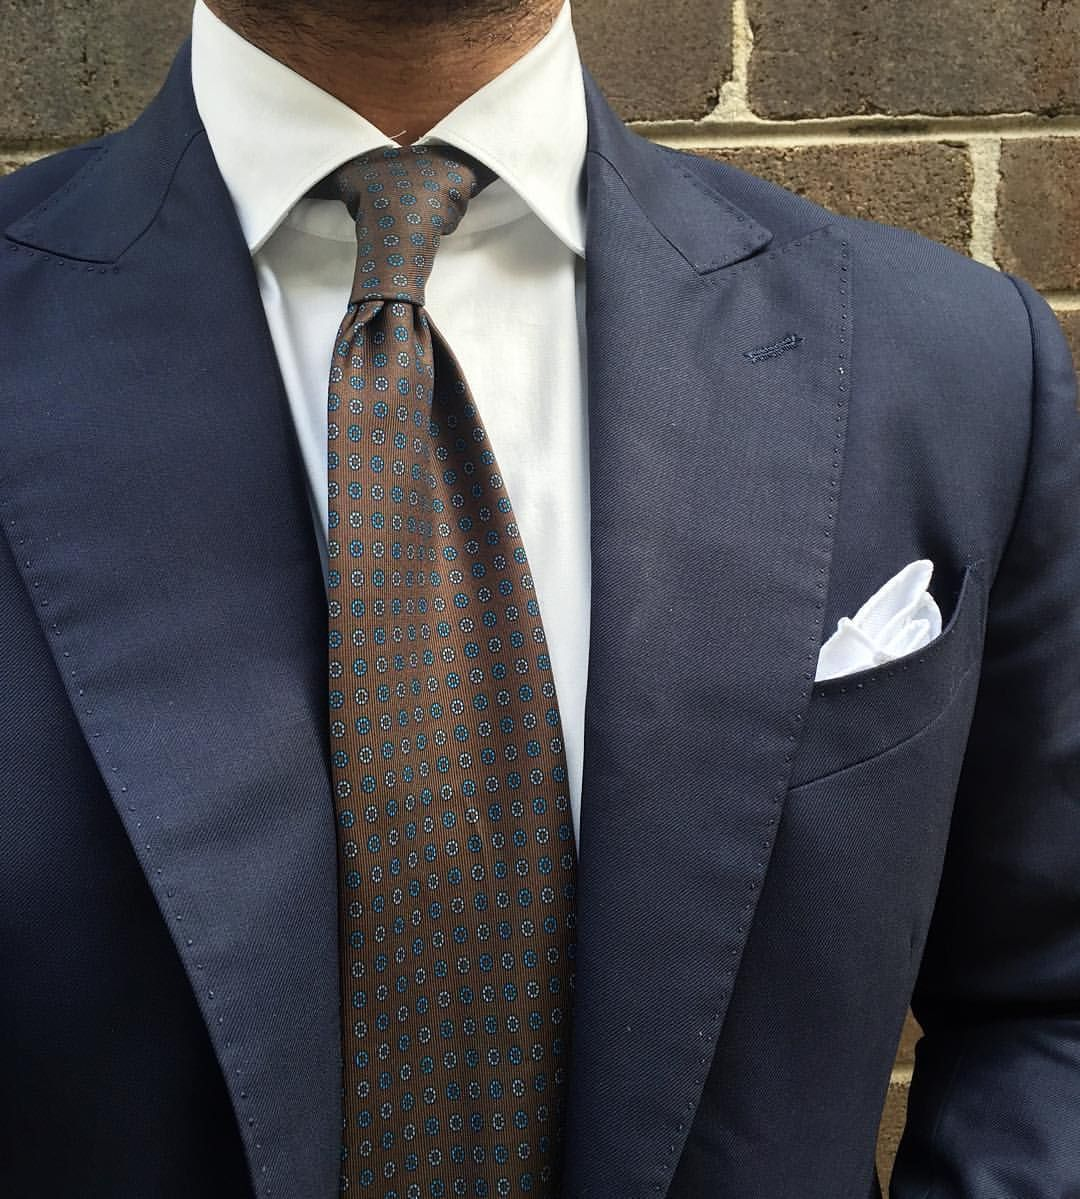 Navy jacket with peak lapels, white shirt, brown tie